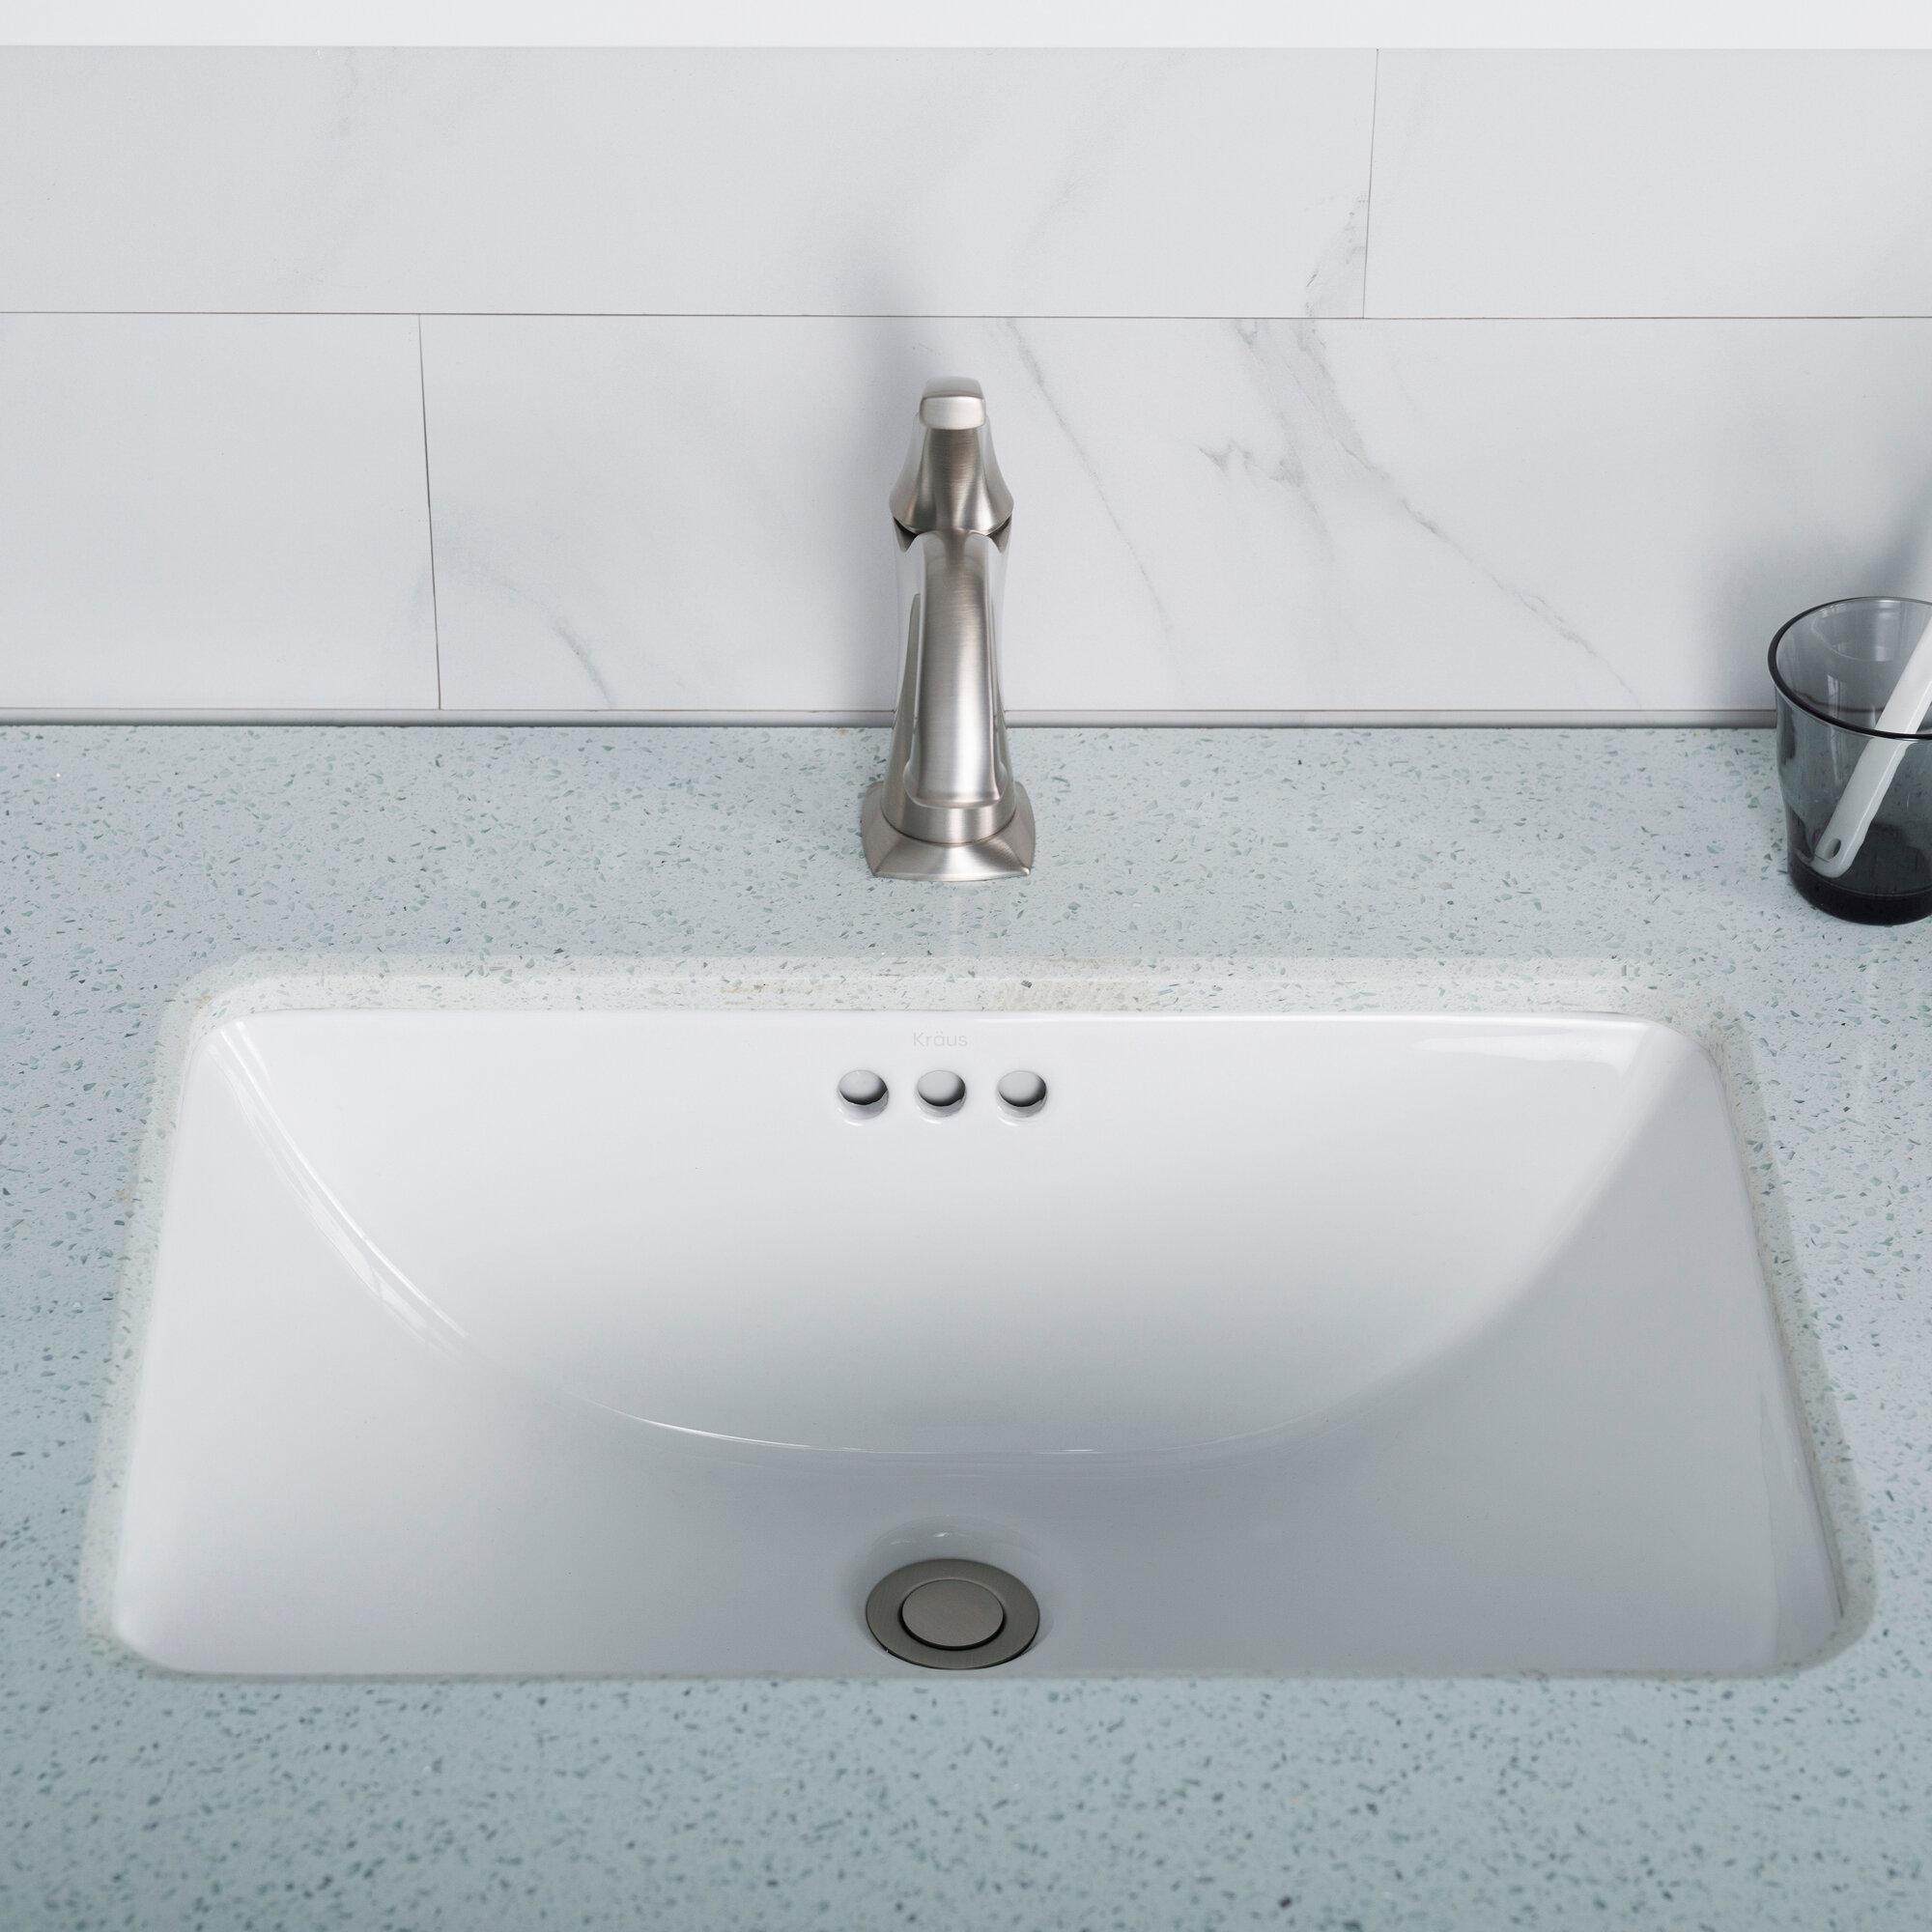 Kcu 241 kraus elavo ceramic rectangular undermount bathroom sink with overflow reviews wayfair